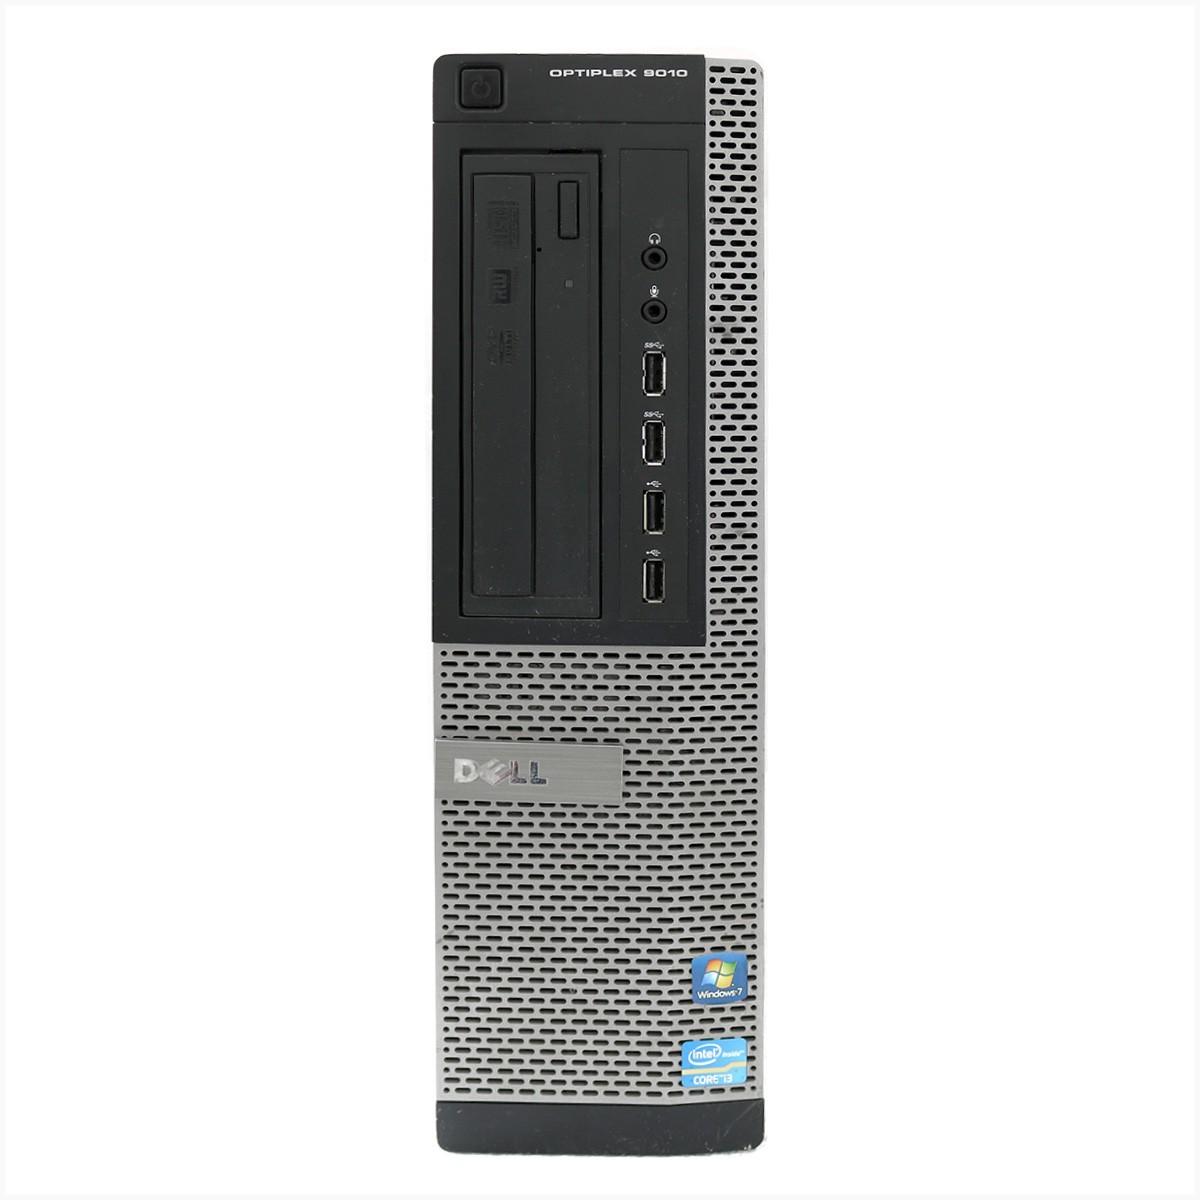 Computador Dell 9010 Desktop i3 4gb 250gb - Usado